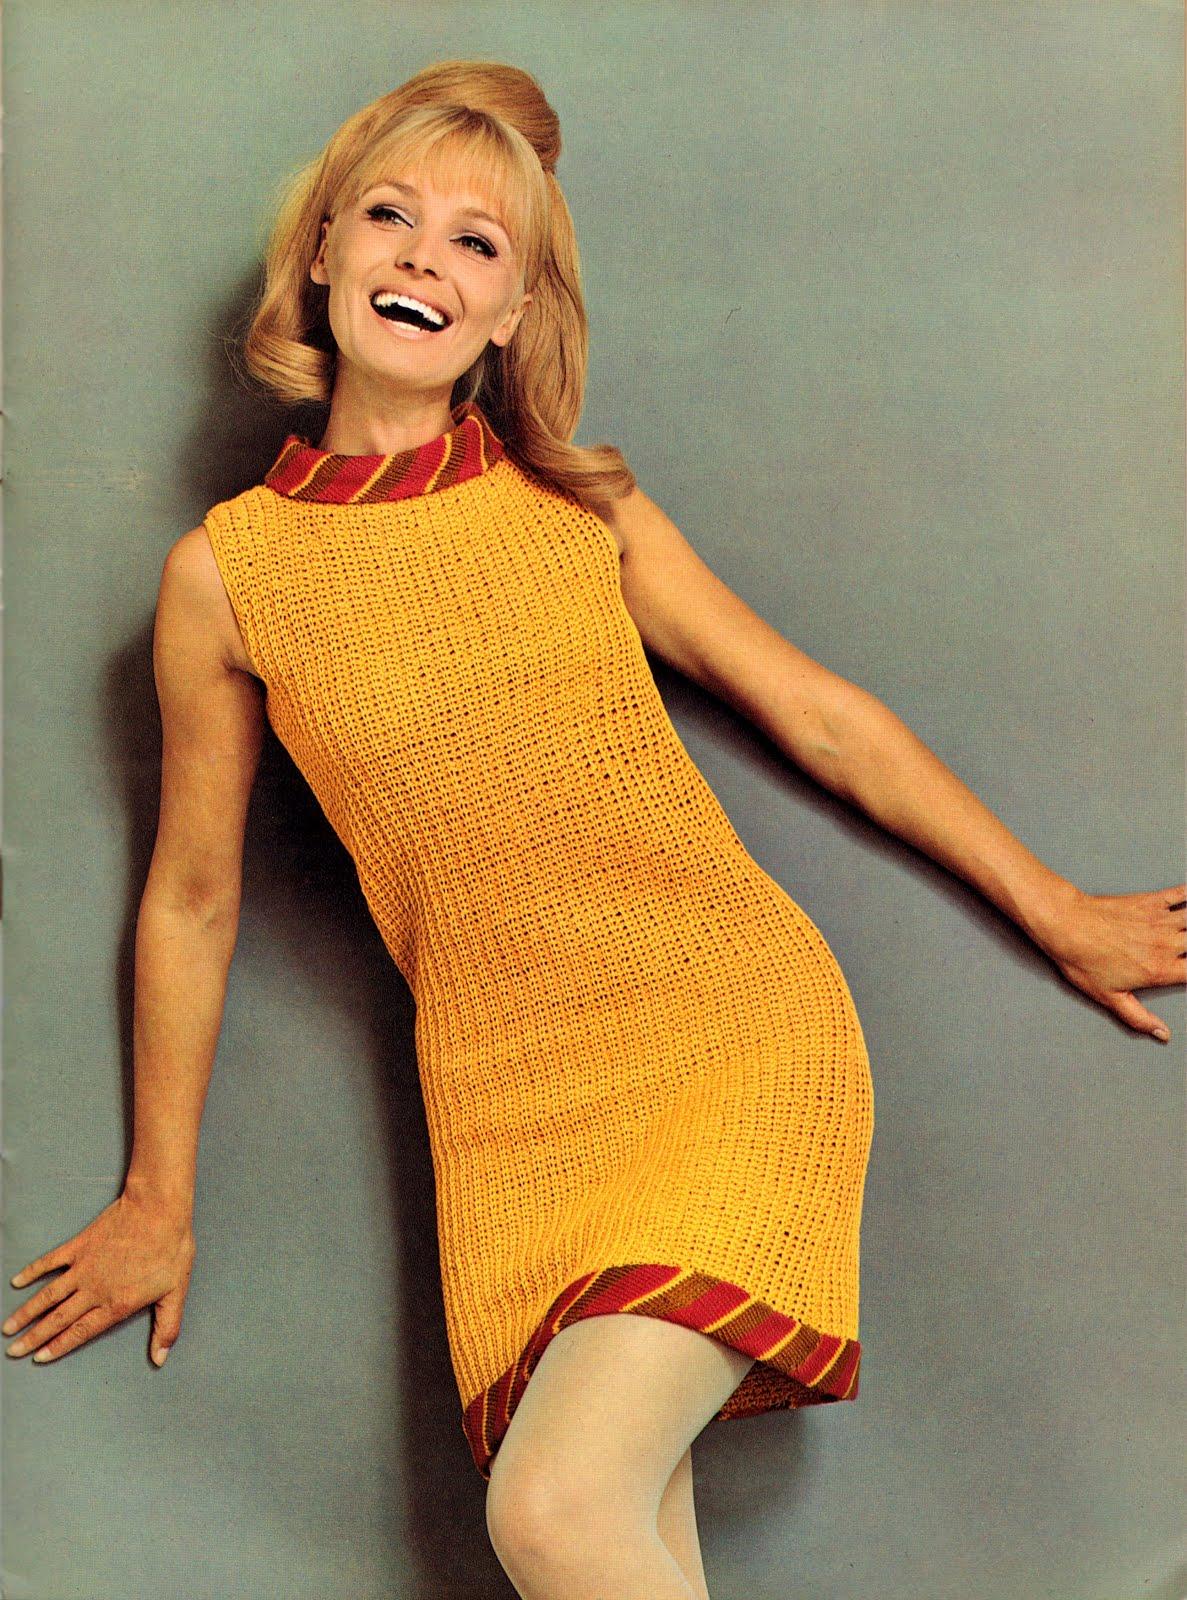 1960s magazine 70s spinnerin magazines 60s knitted 1960 retro dresses womens mini short skirt everyday clothing older 1970s pretty skirts